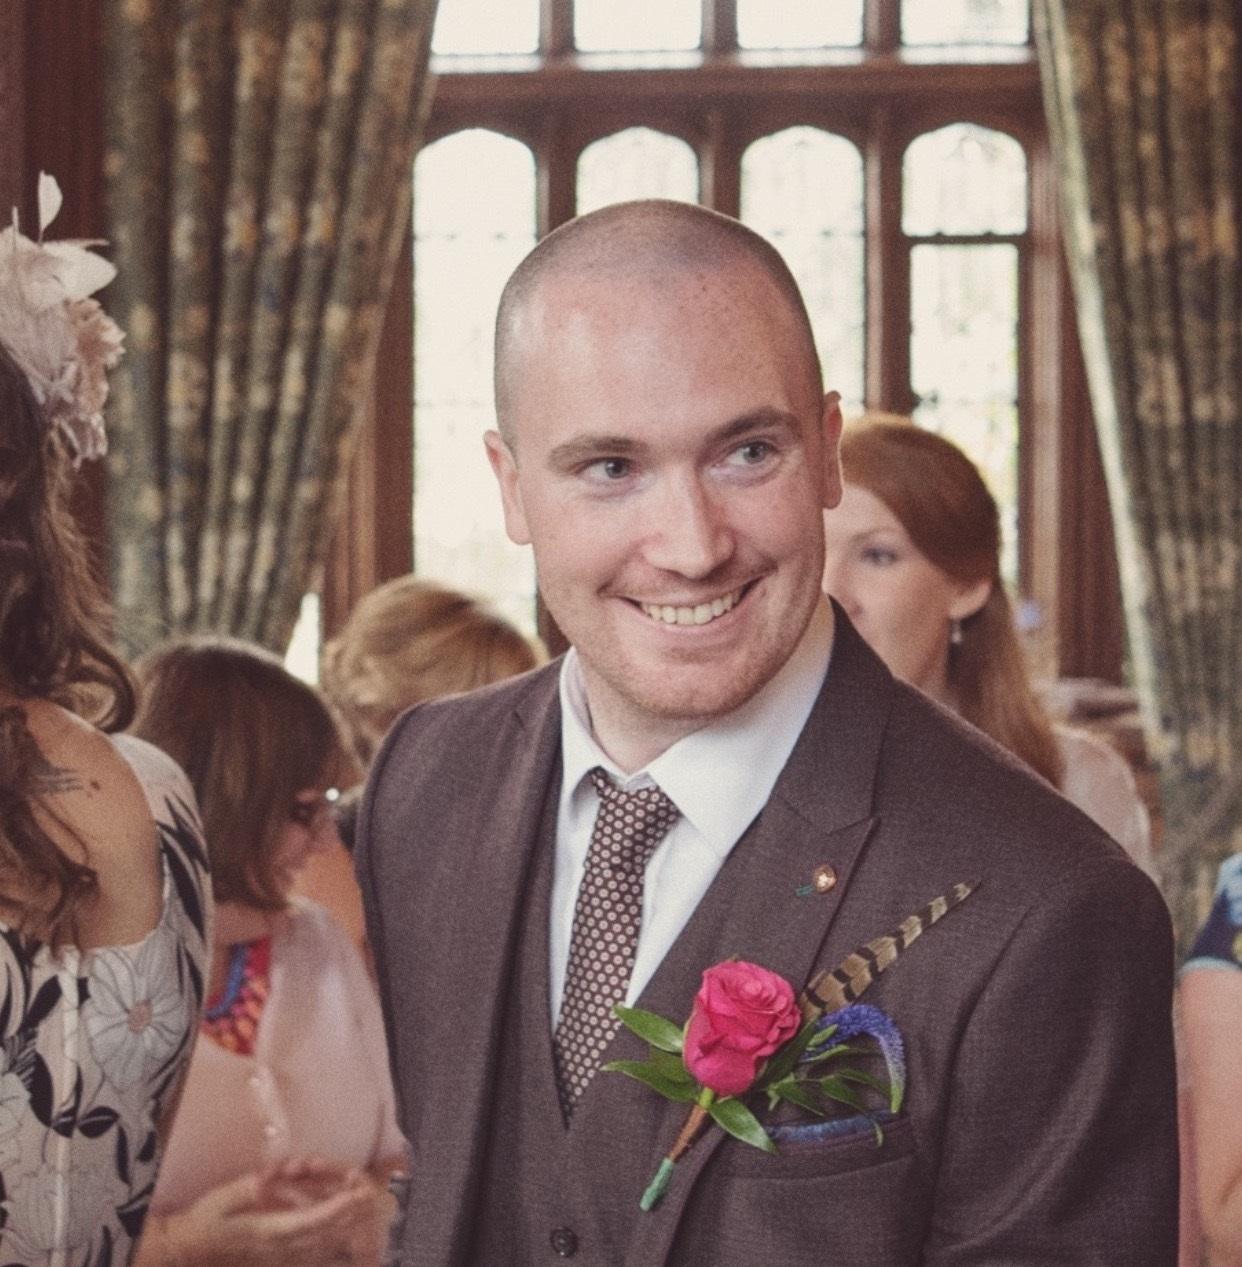 http://scriptumds.co.uk/wp-content/uploads/2018/03/ProfilePic-Wedding.jpg